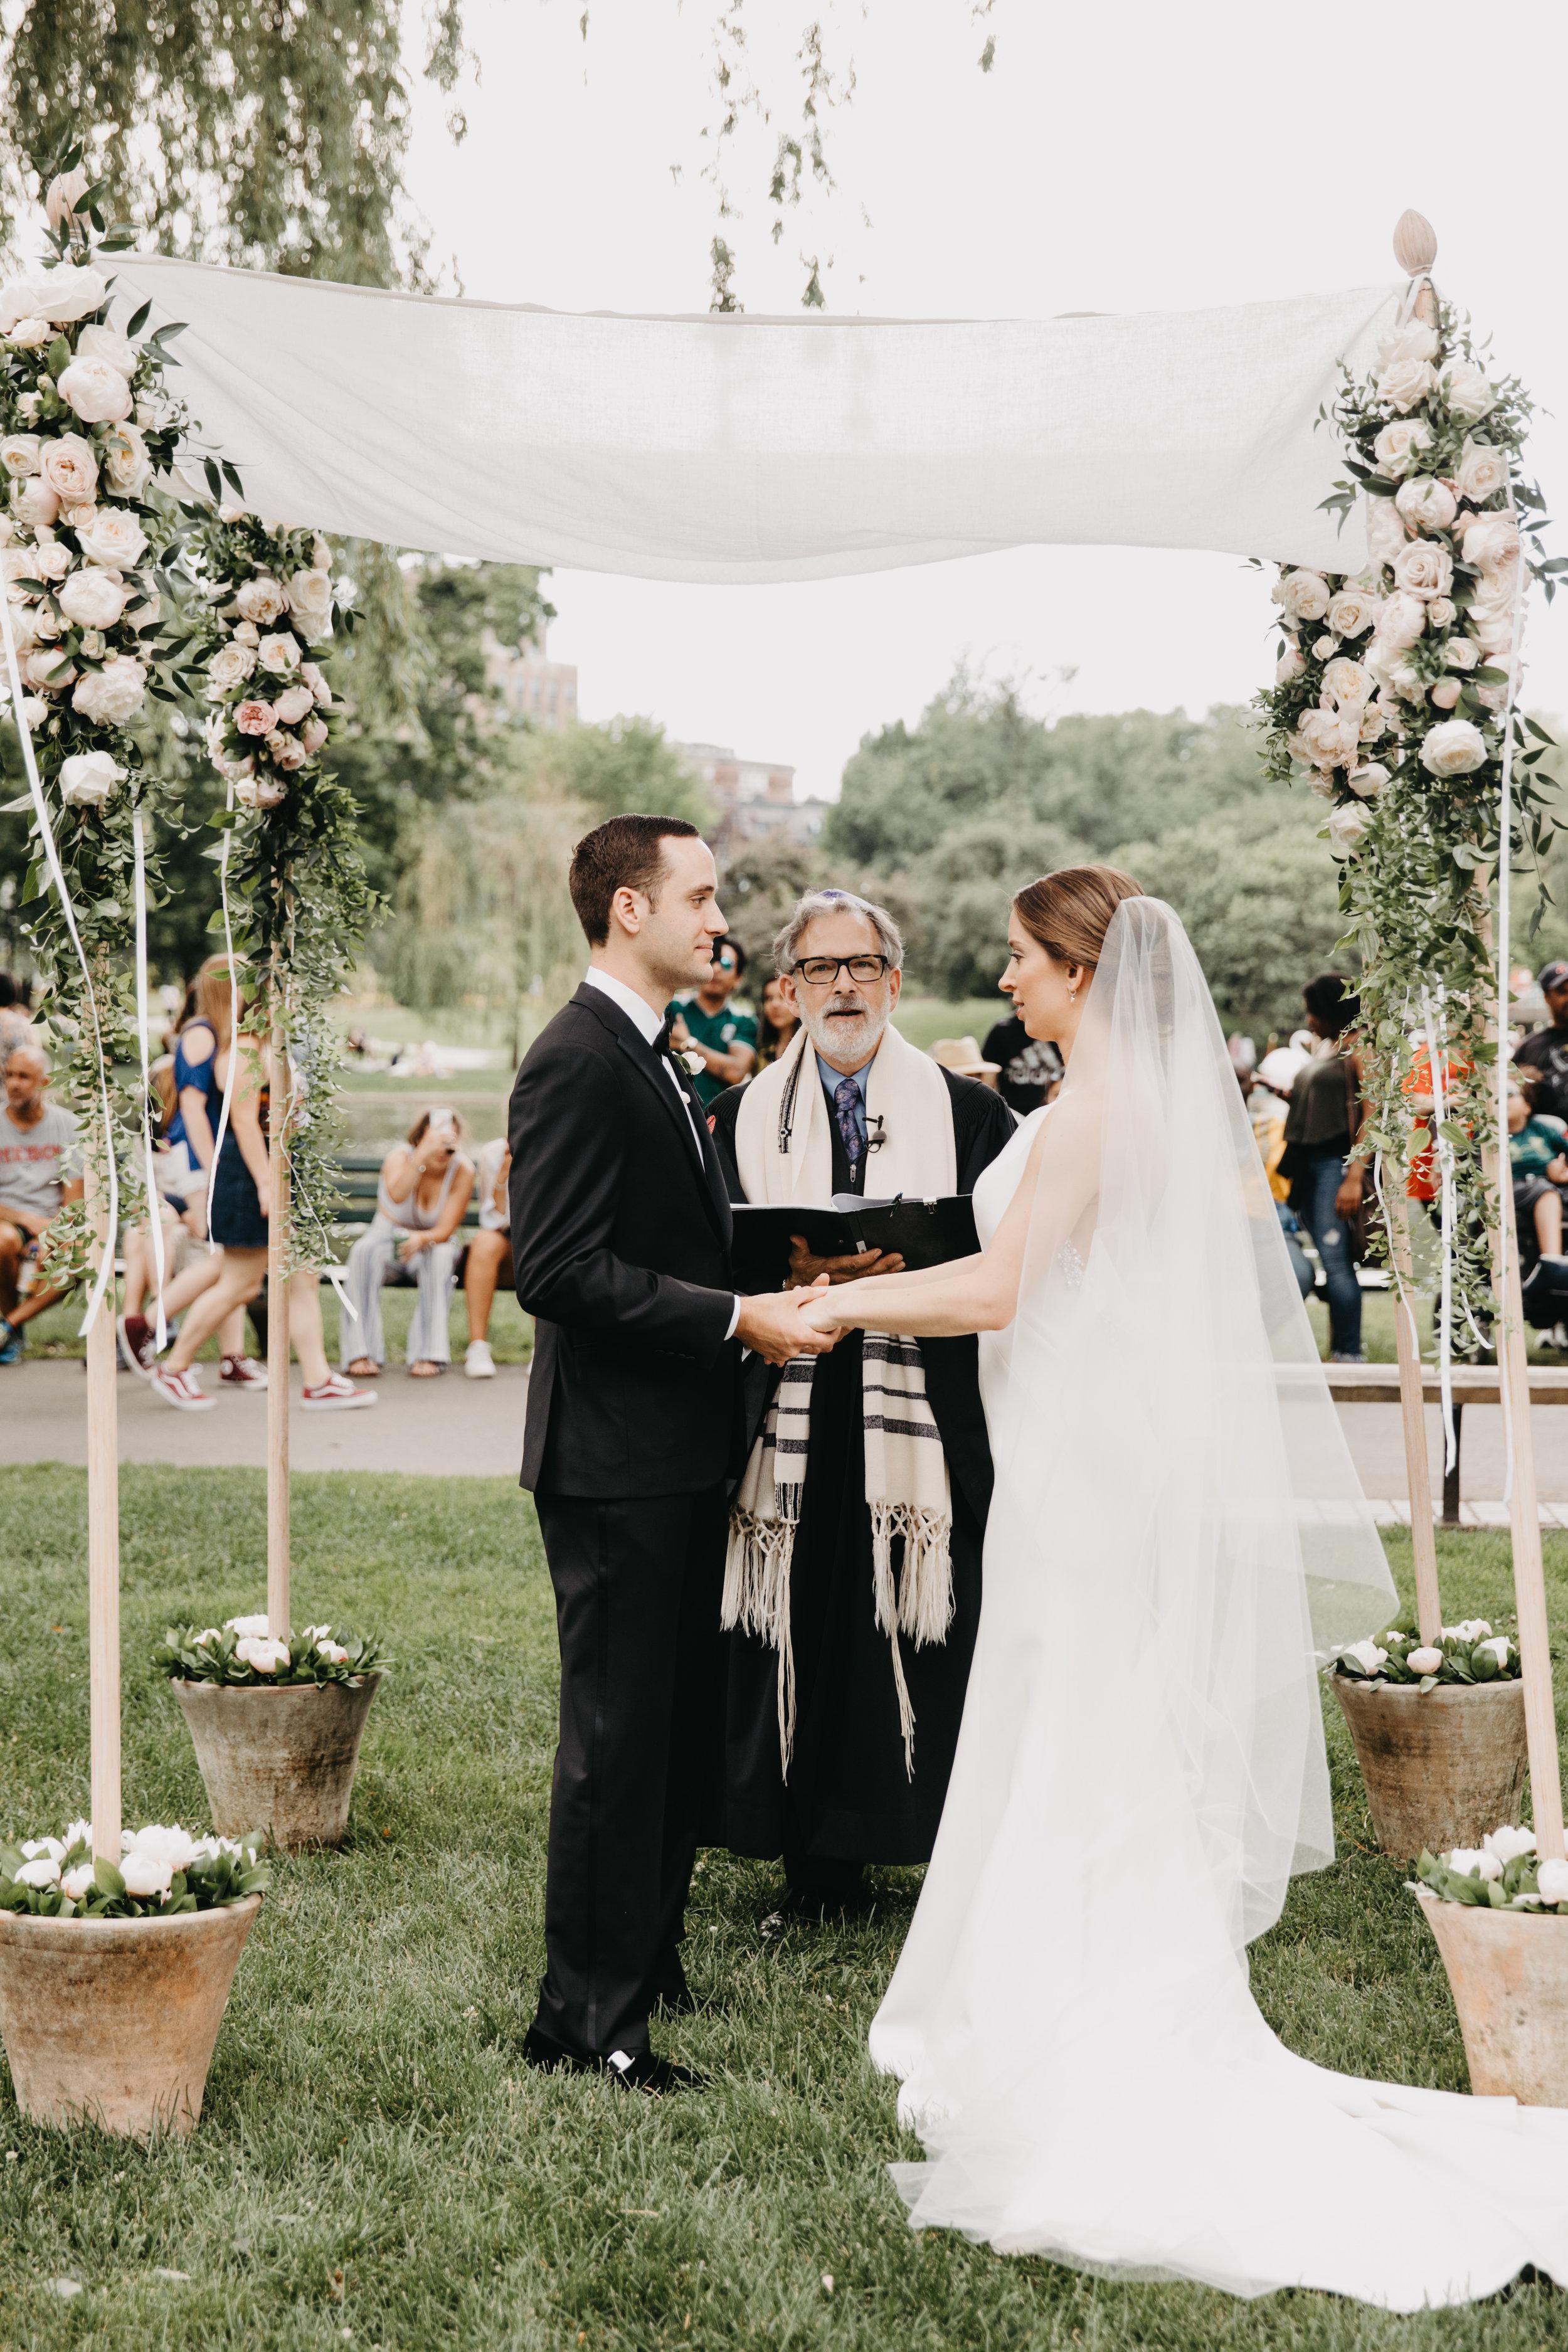 JEWISH WEDDING, BOSTON PUBLIC GARDEN, NICOLE SIMERAL, WEDDING PLANNER, FOUR SEASONS, BOSTON., DESTINATION WEDDING